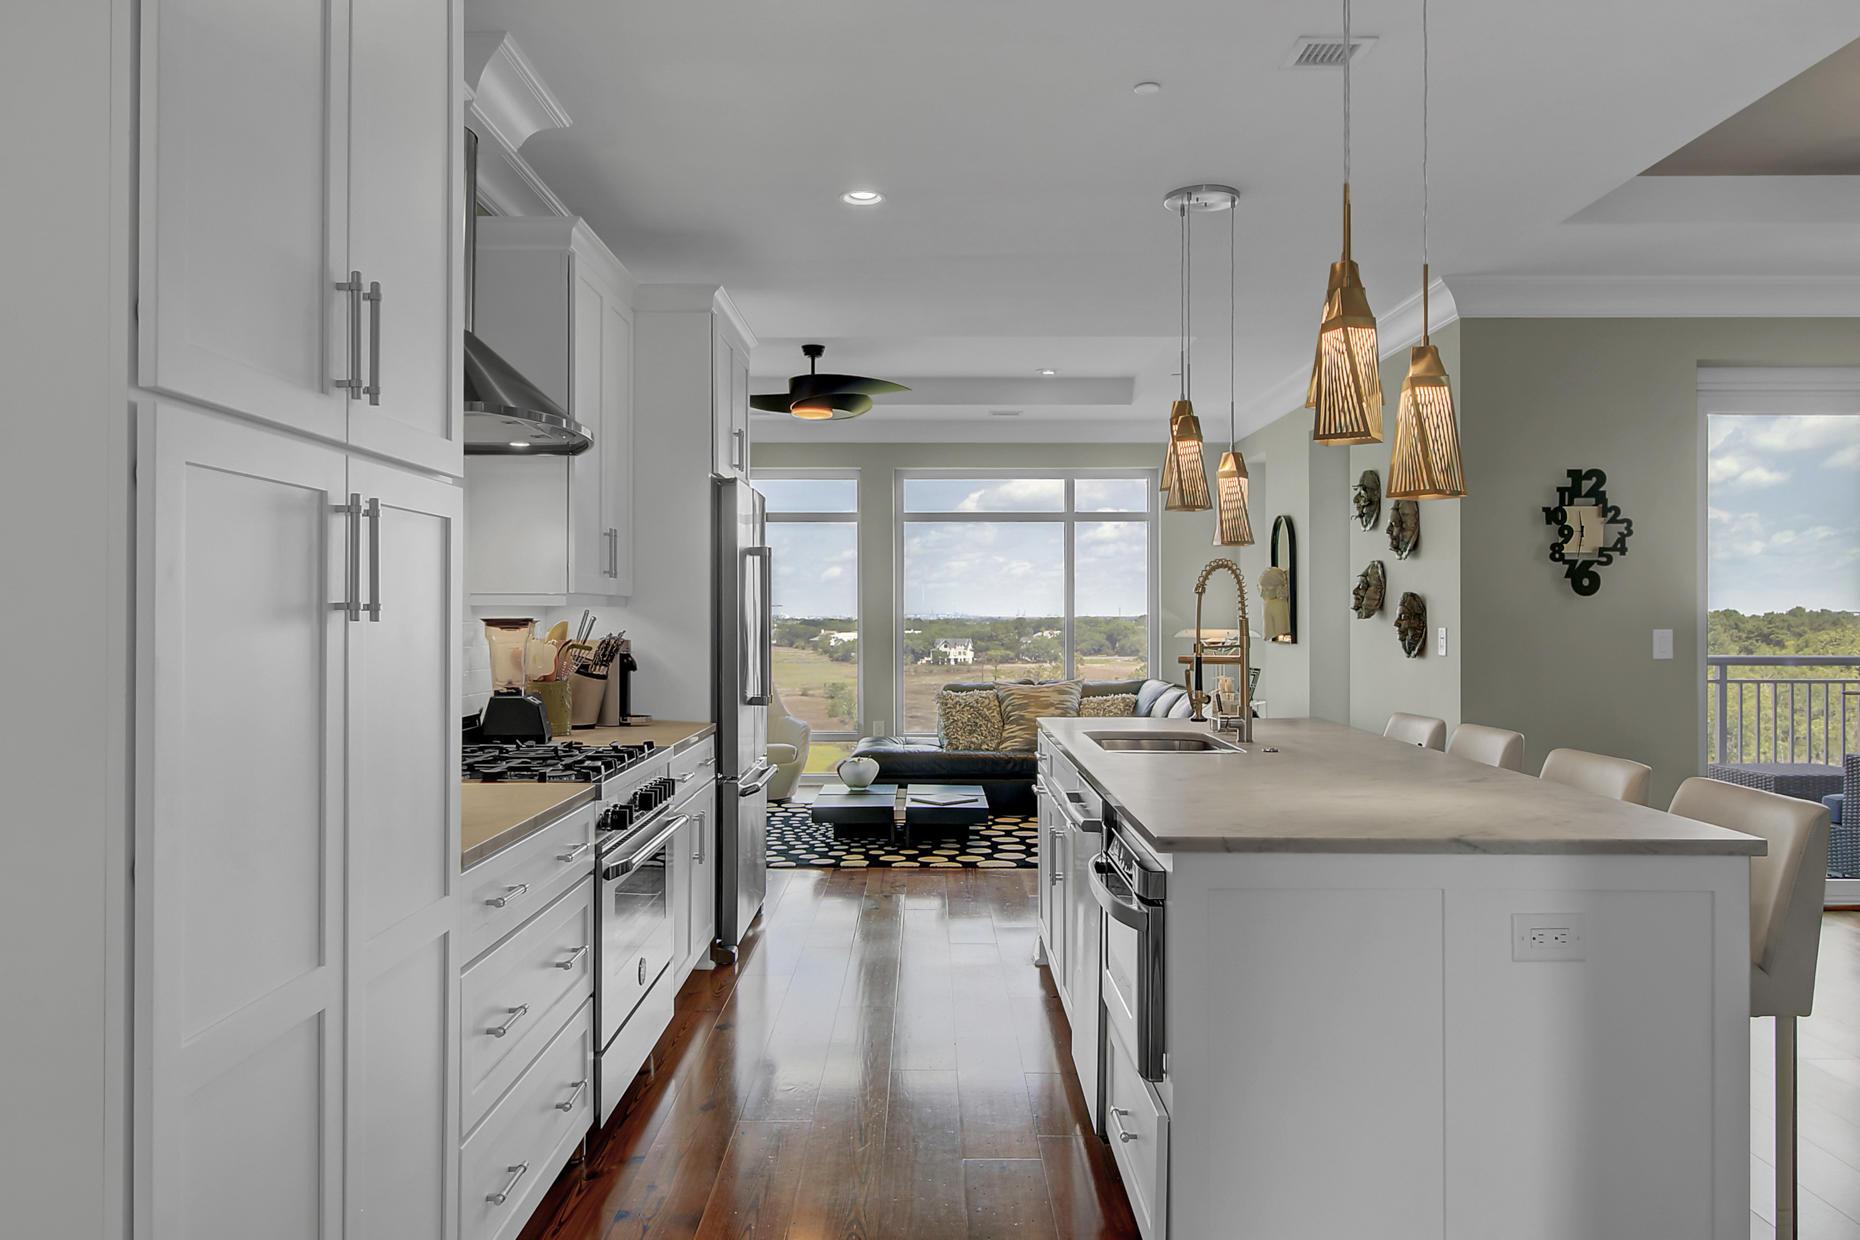 Tides IV Condominiums Homes For Sale - 155 Wingo Way, Mount Pleasant, SC - 25